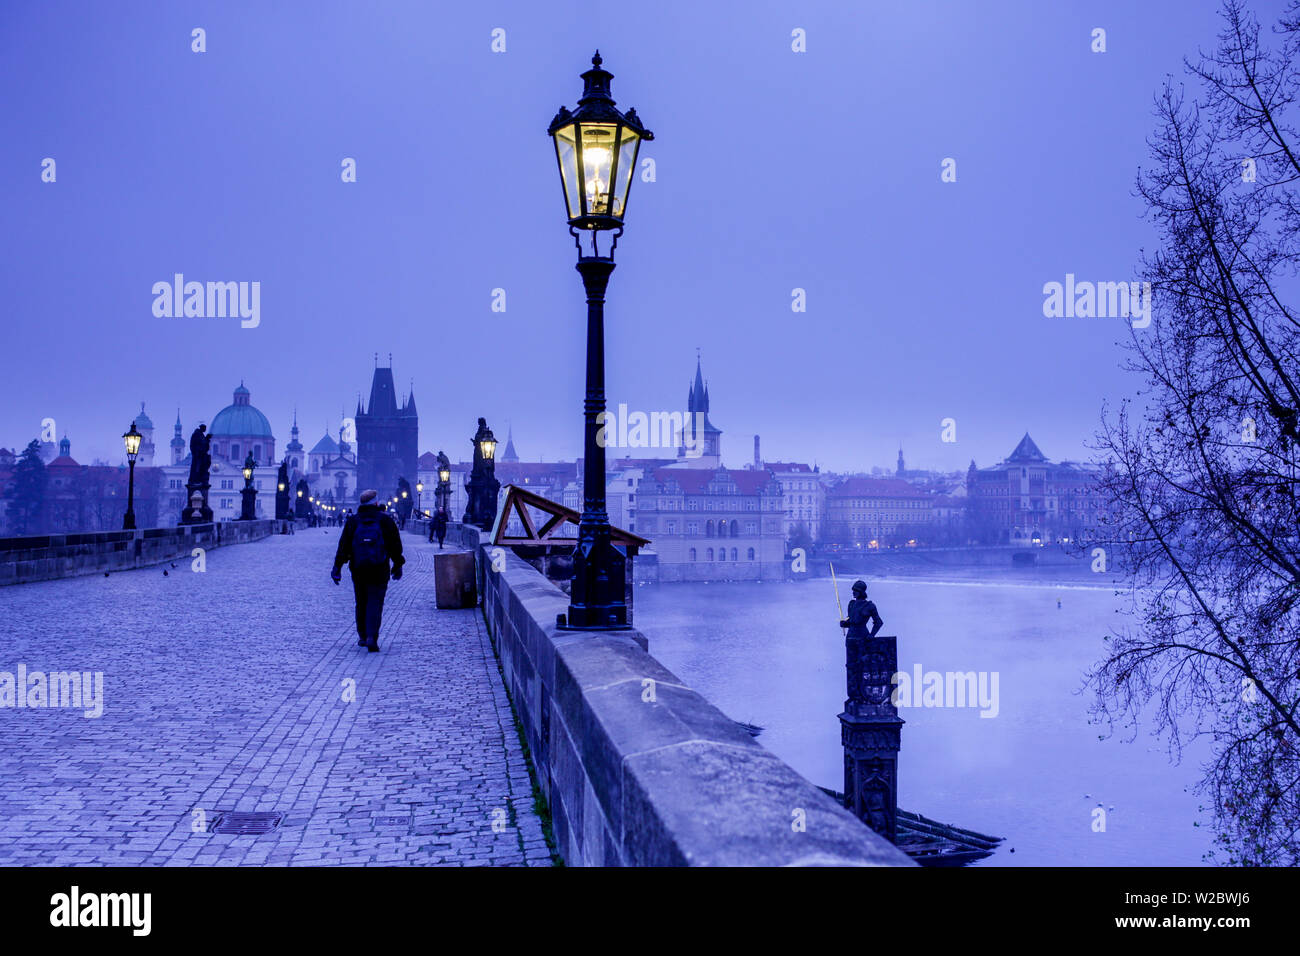 Charles Bridge, (Karluv most), Prague, Czech Republic - Stock Image